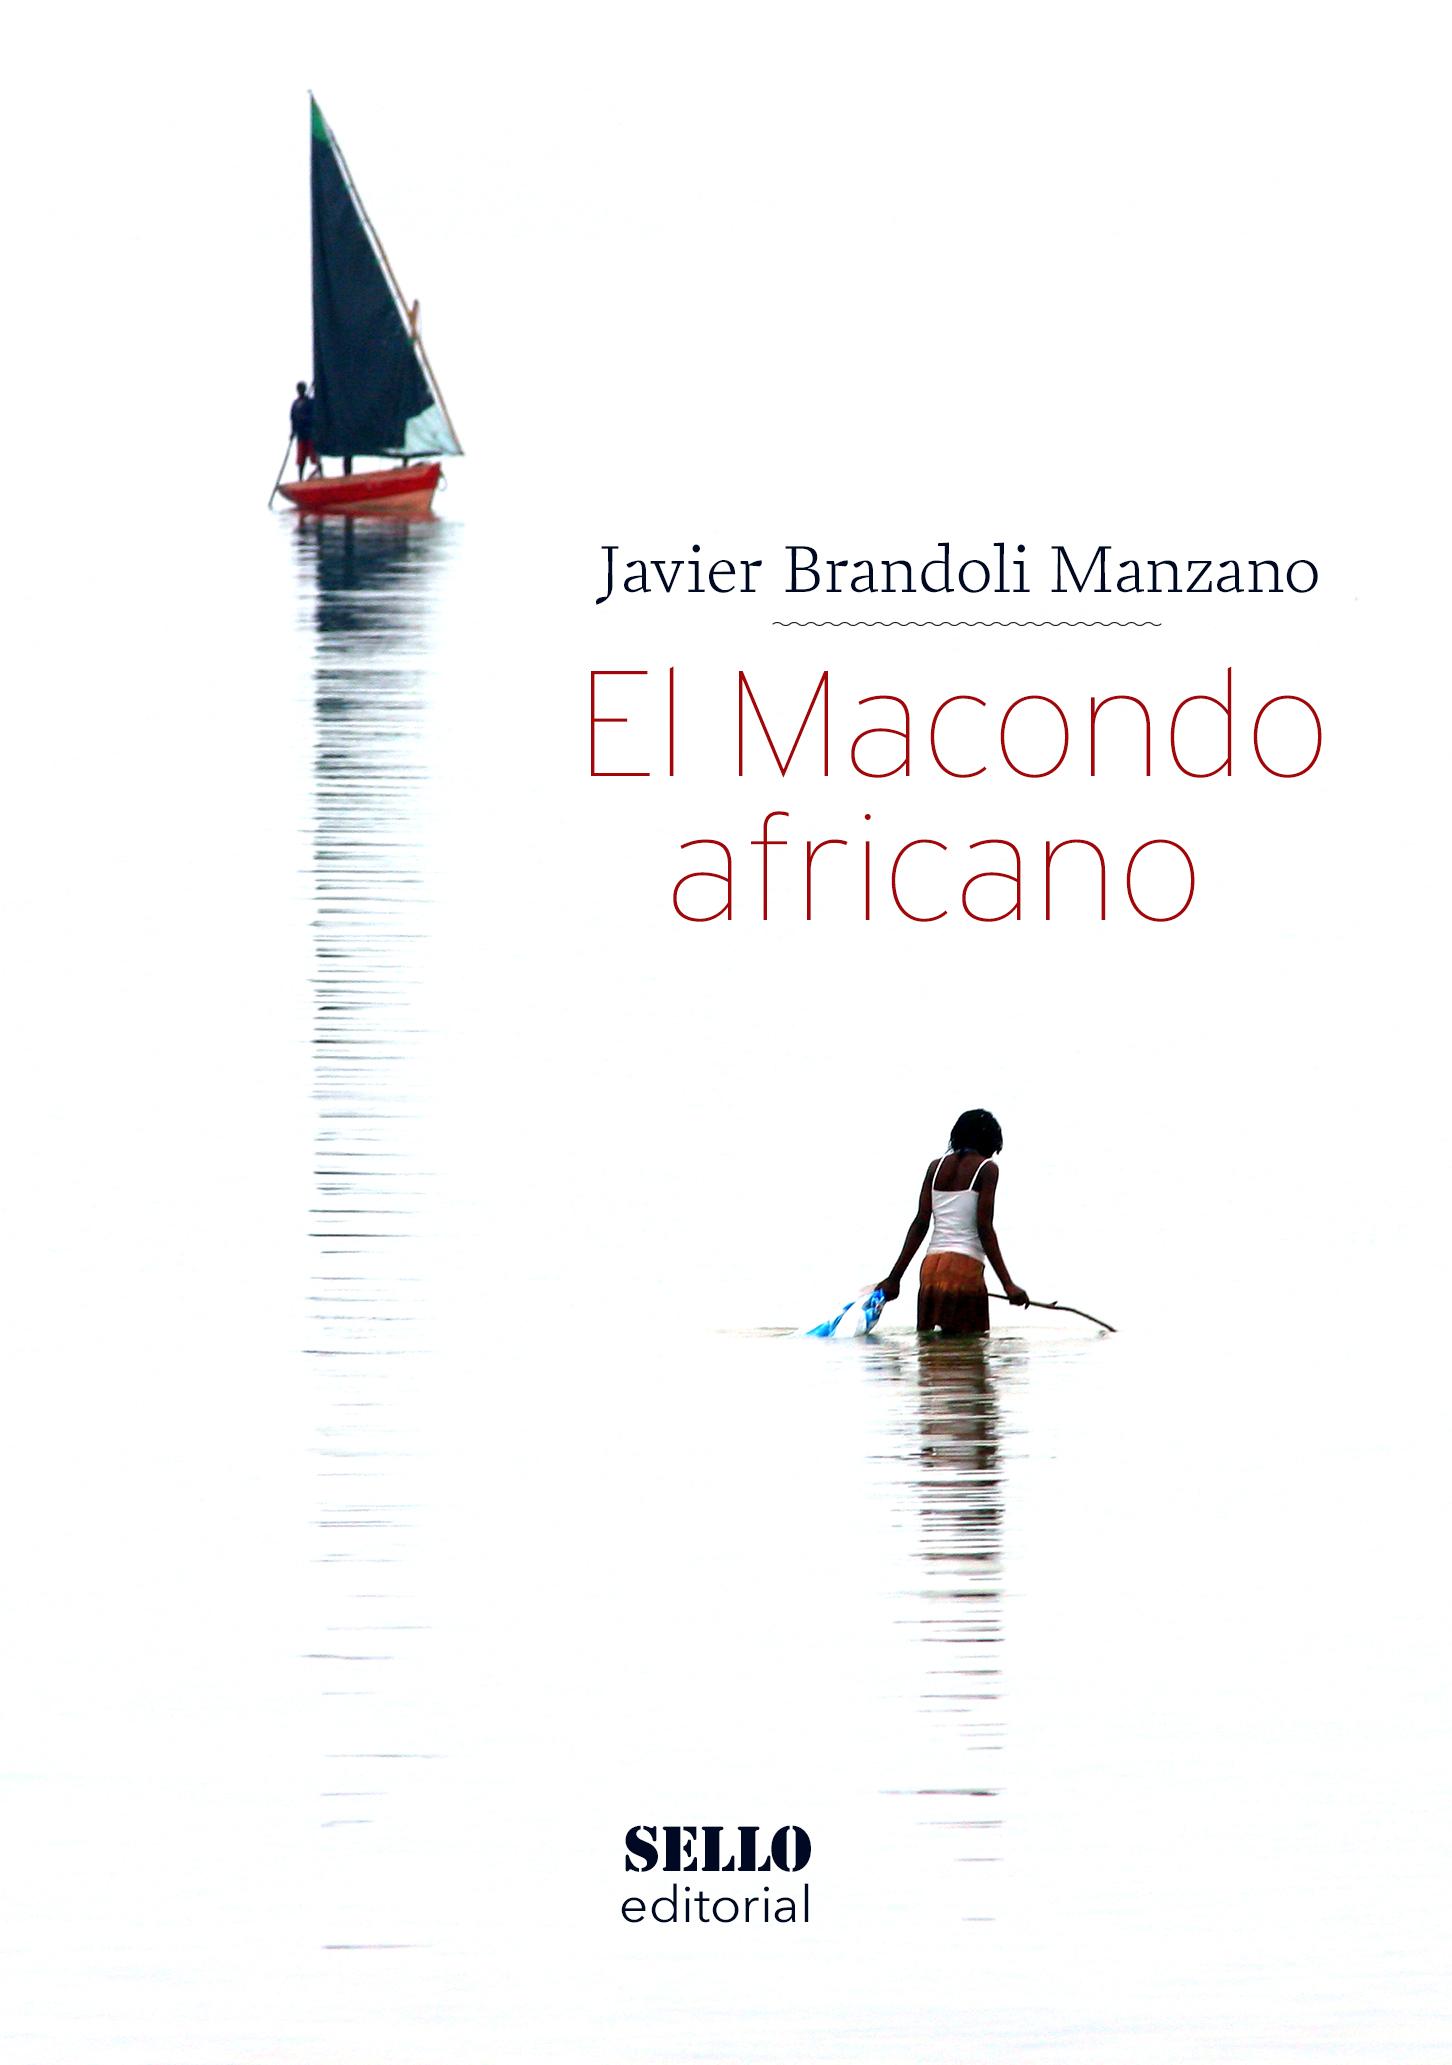 2015-10-28-1446034259-3476240-ElMacondoafricano1.jpg